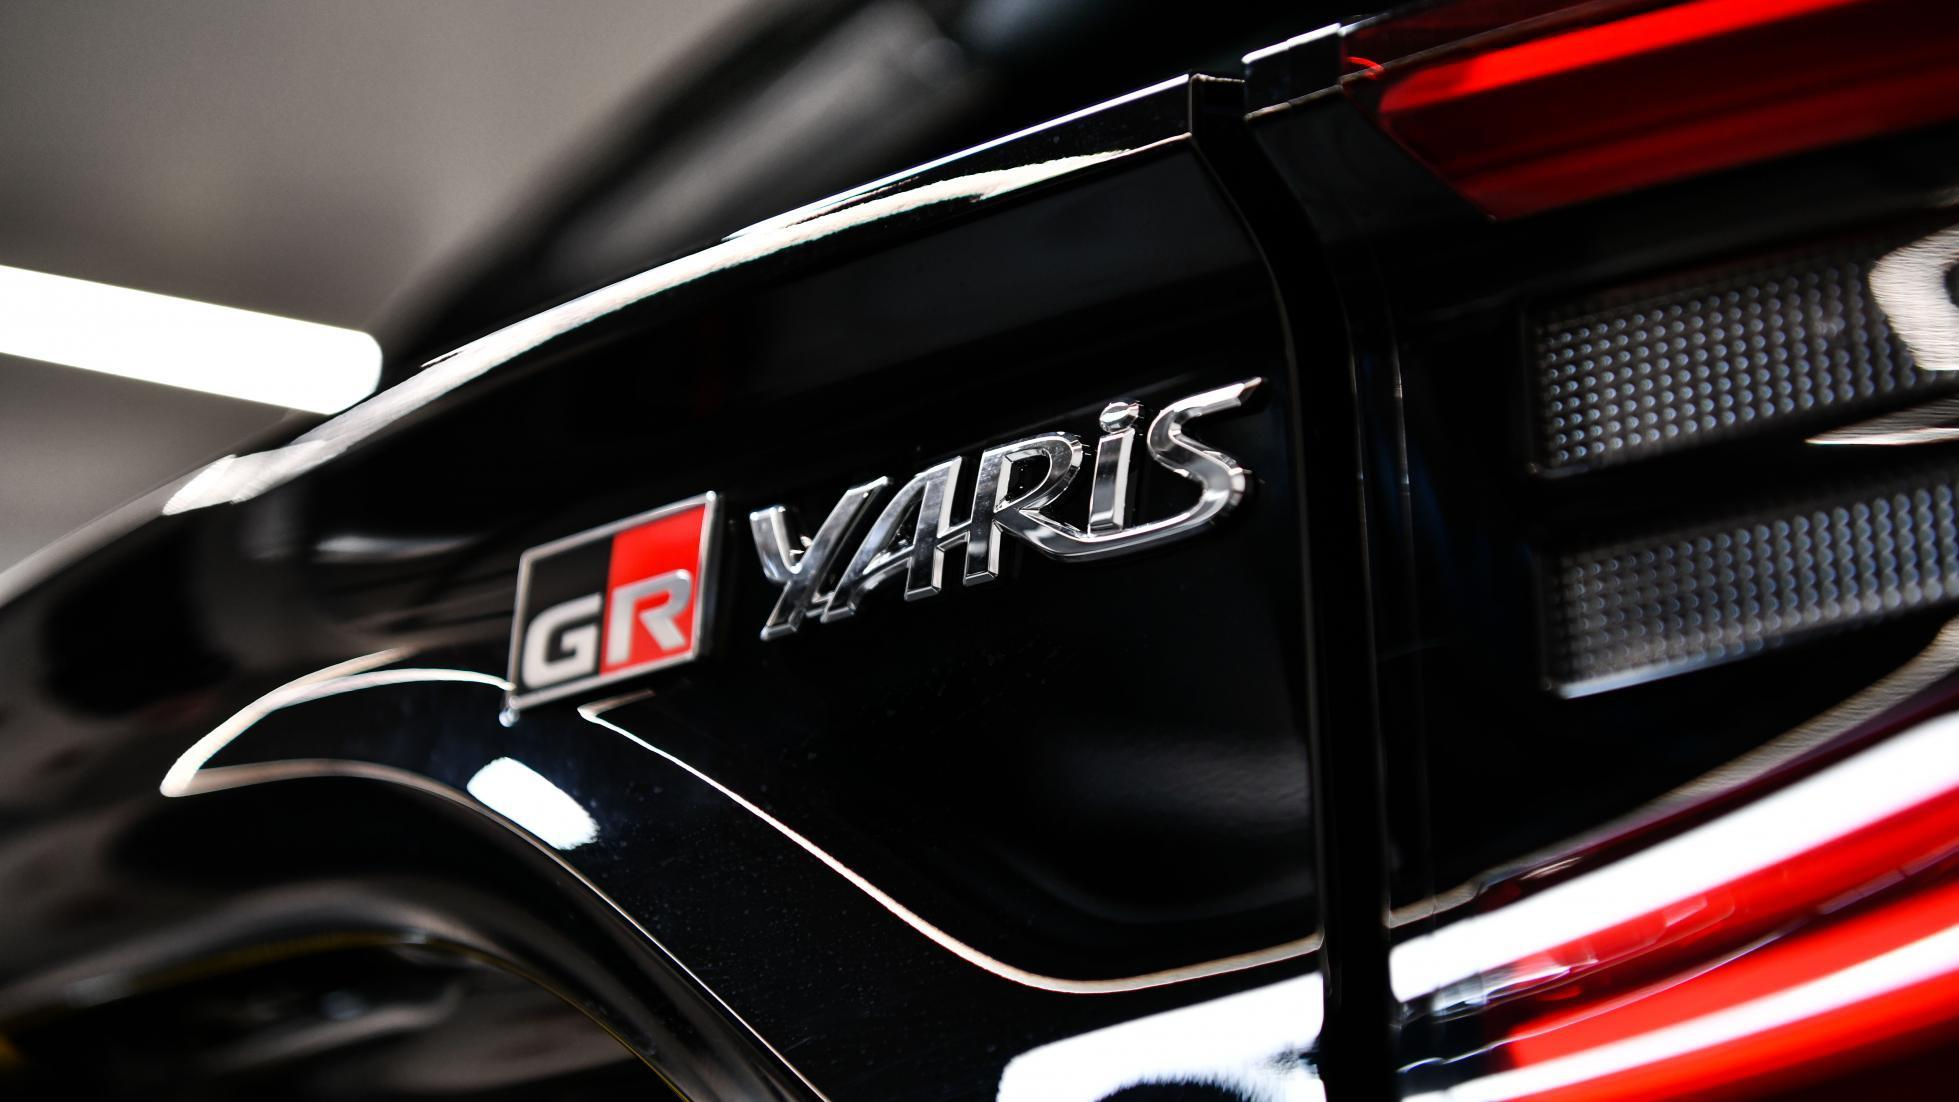 Toyota_GR_Yaris_by_Litchfield_0008